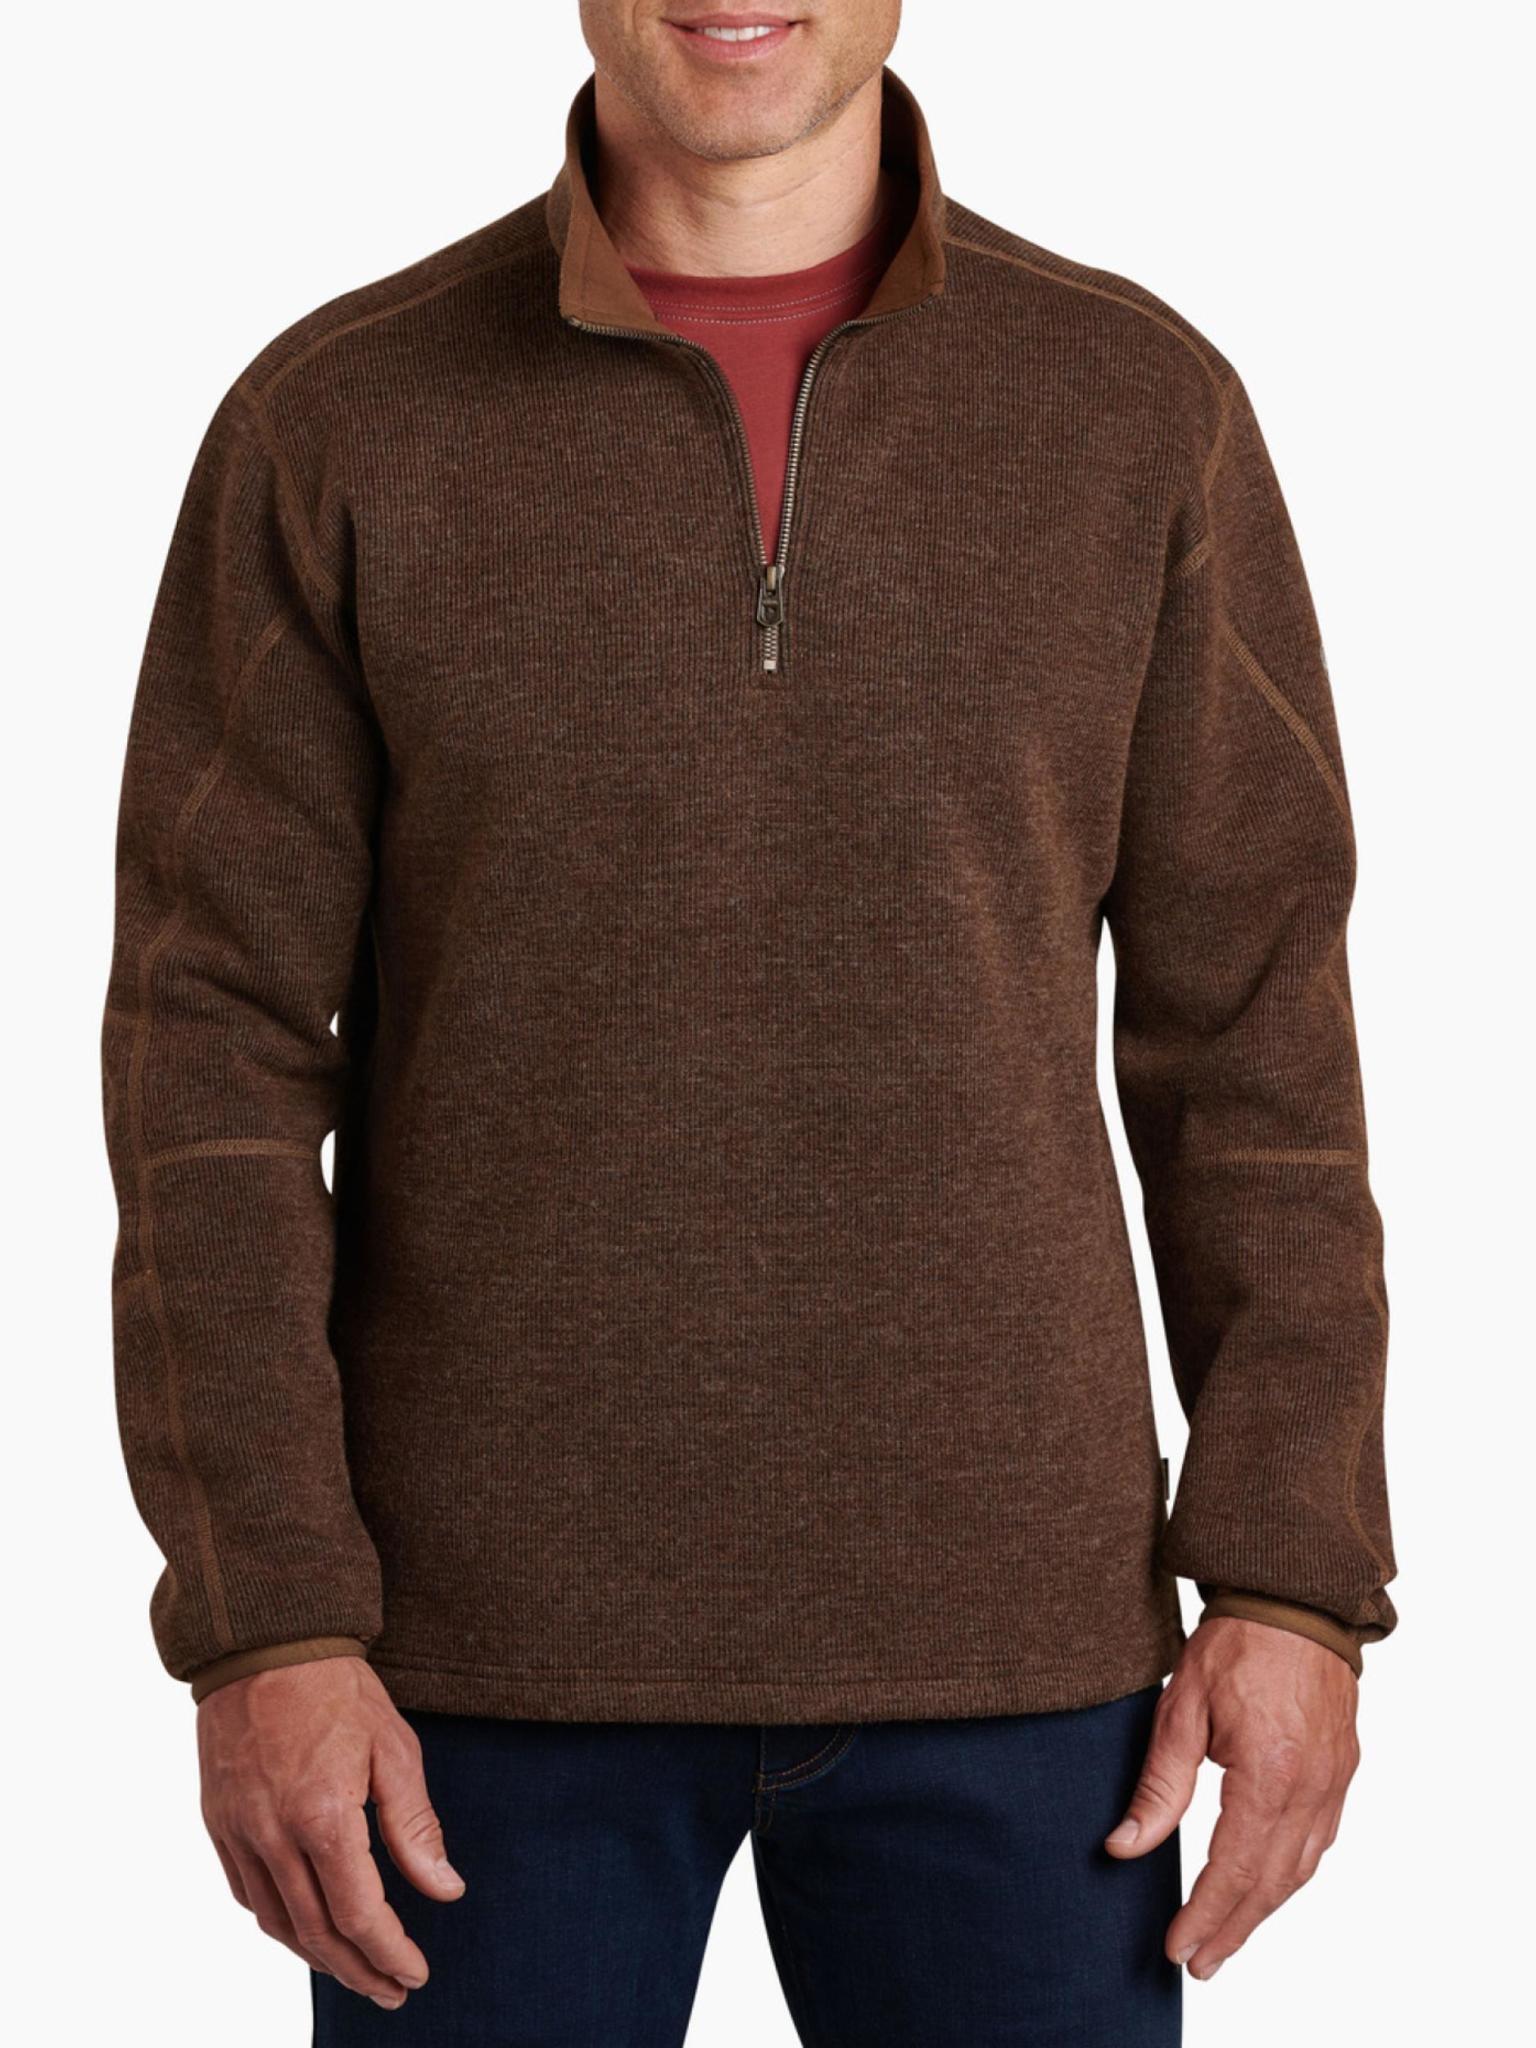 KUHL Men's Thor 1/4 Zip Sweater